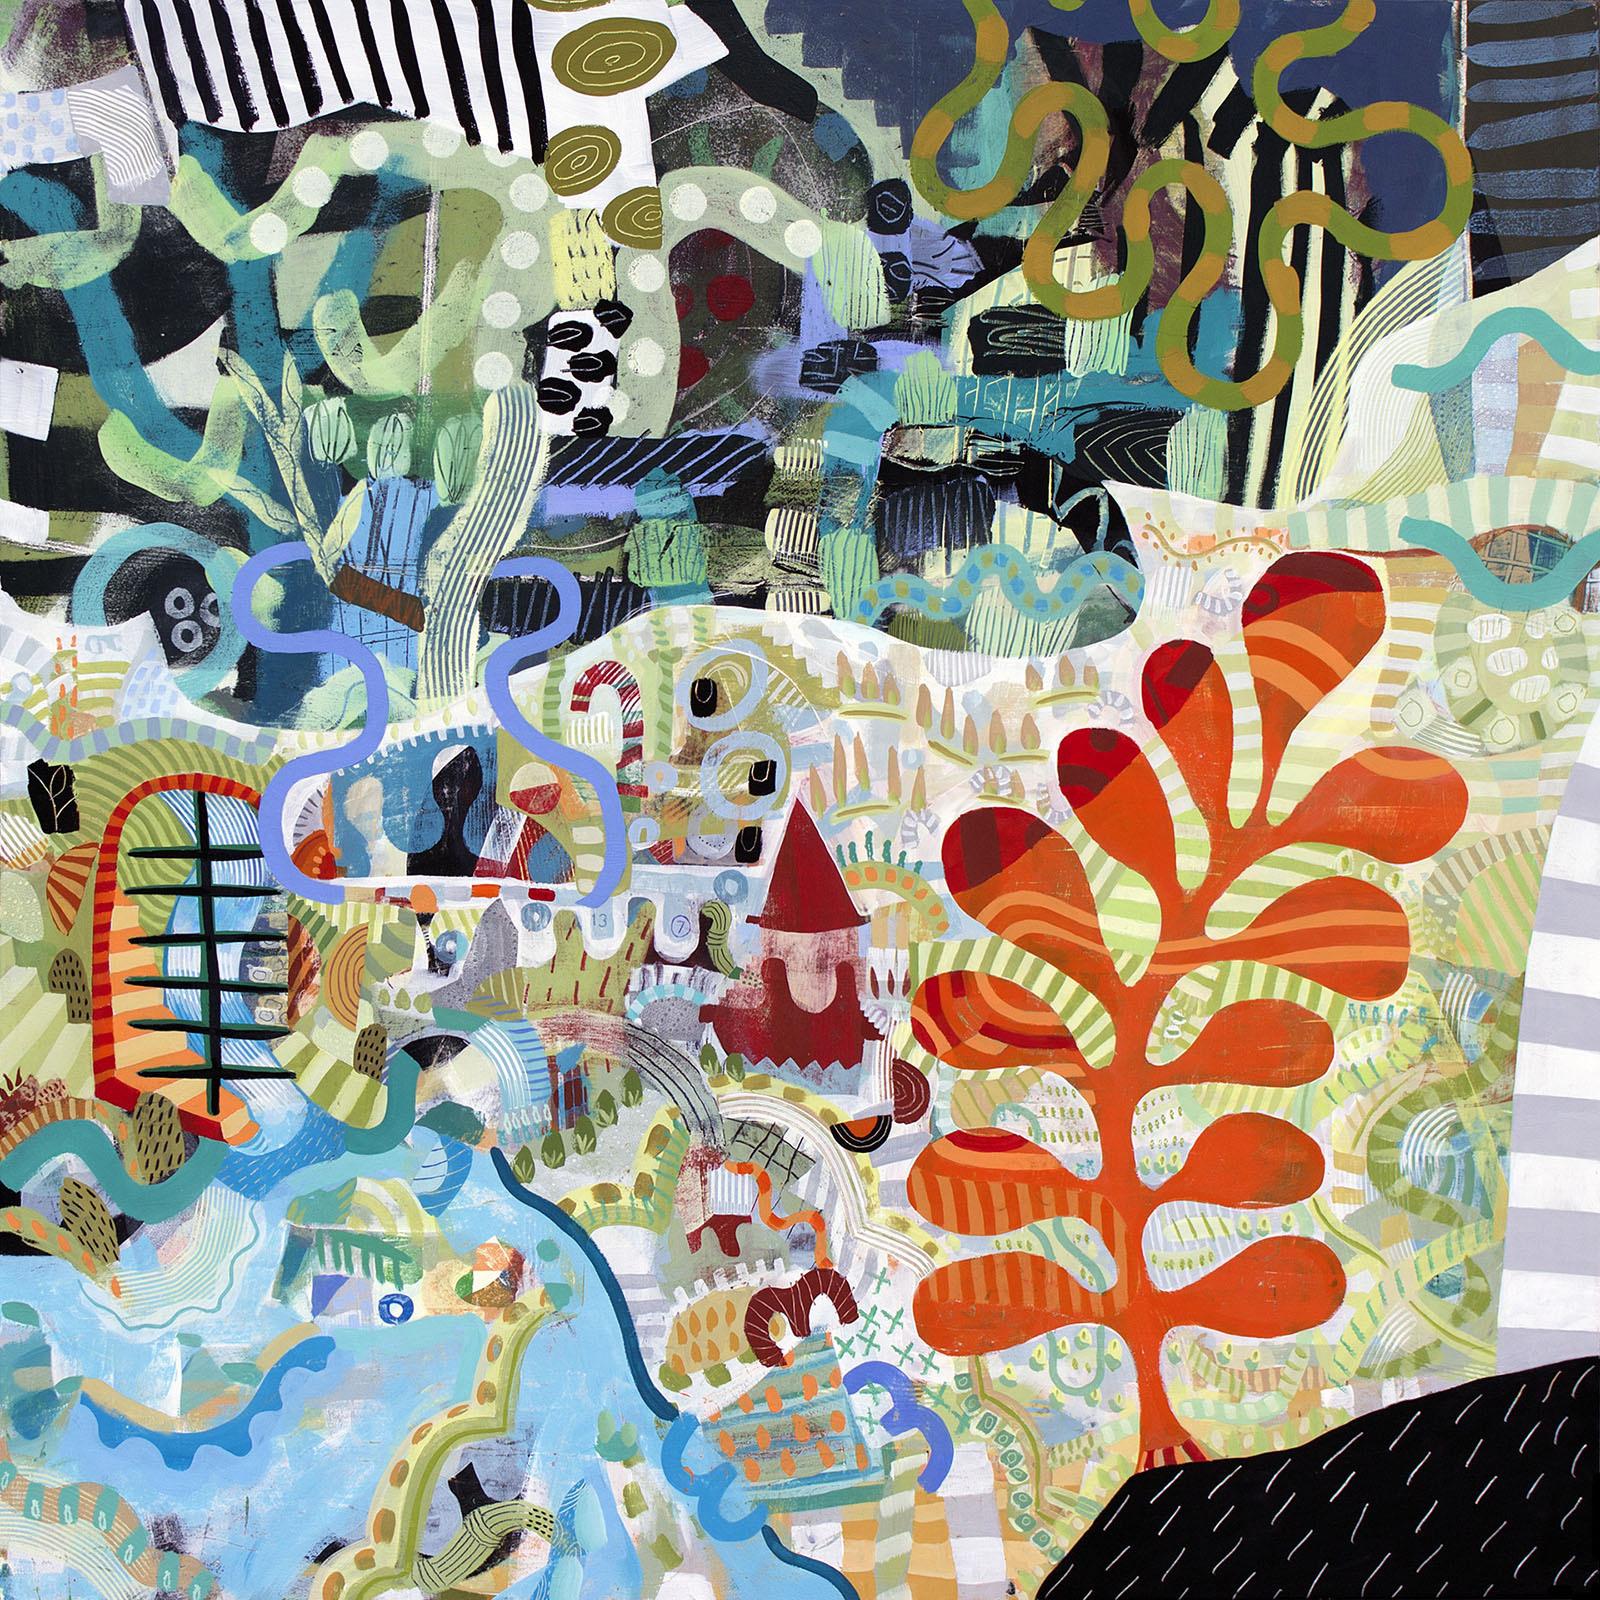 Milton Glaser Rebuilds the Enchanted Forest